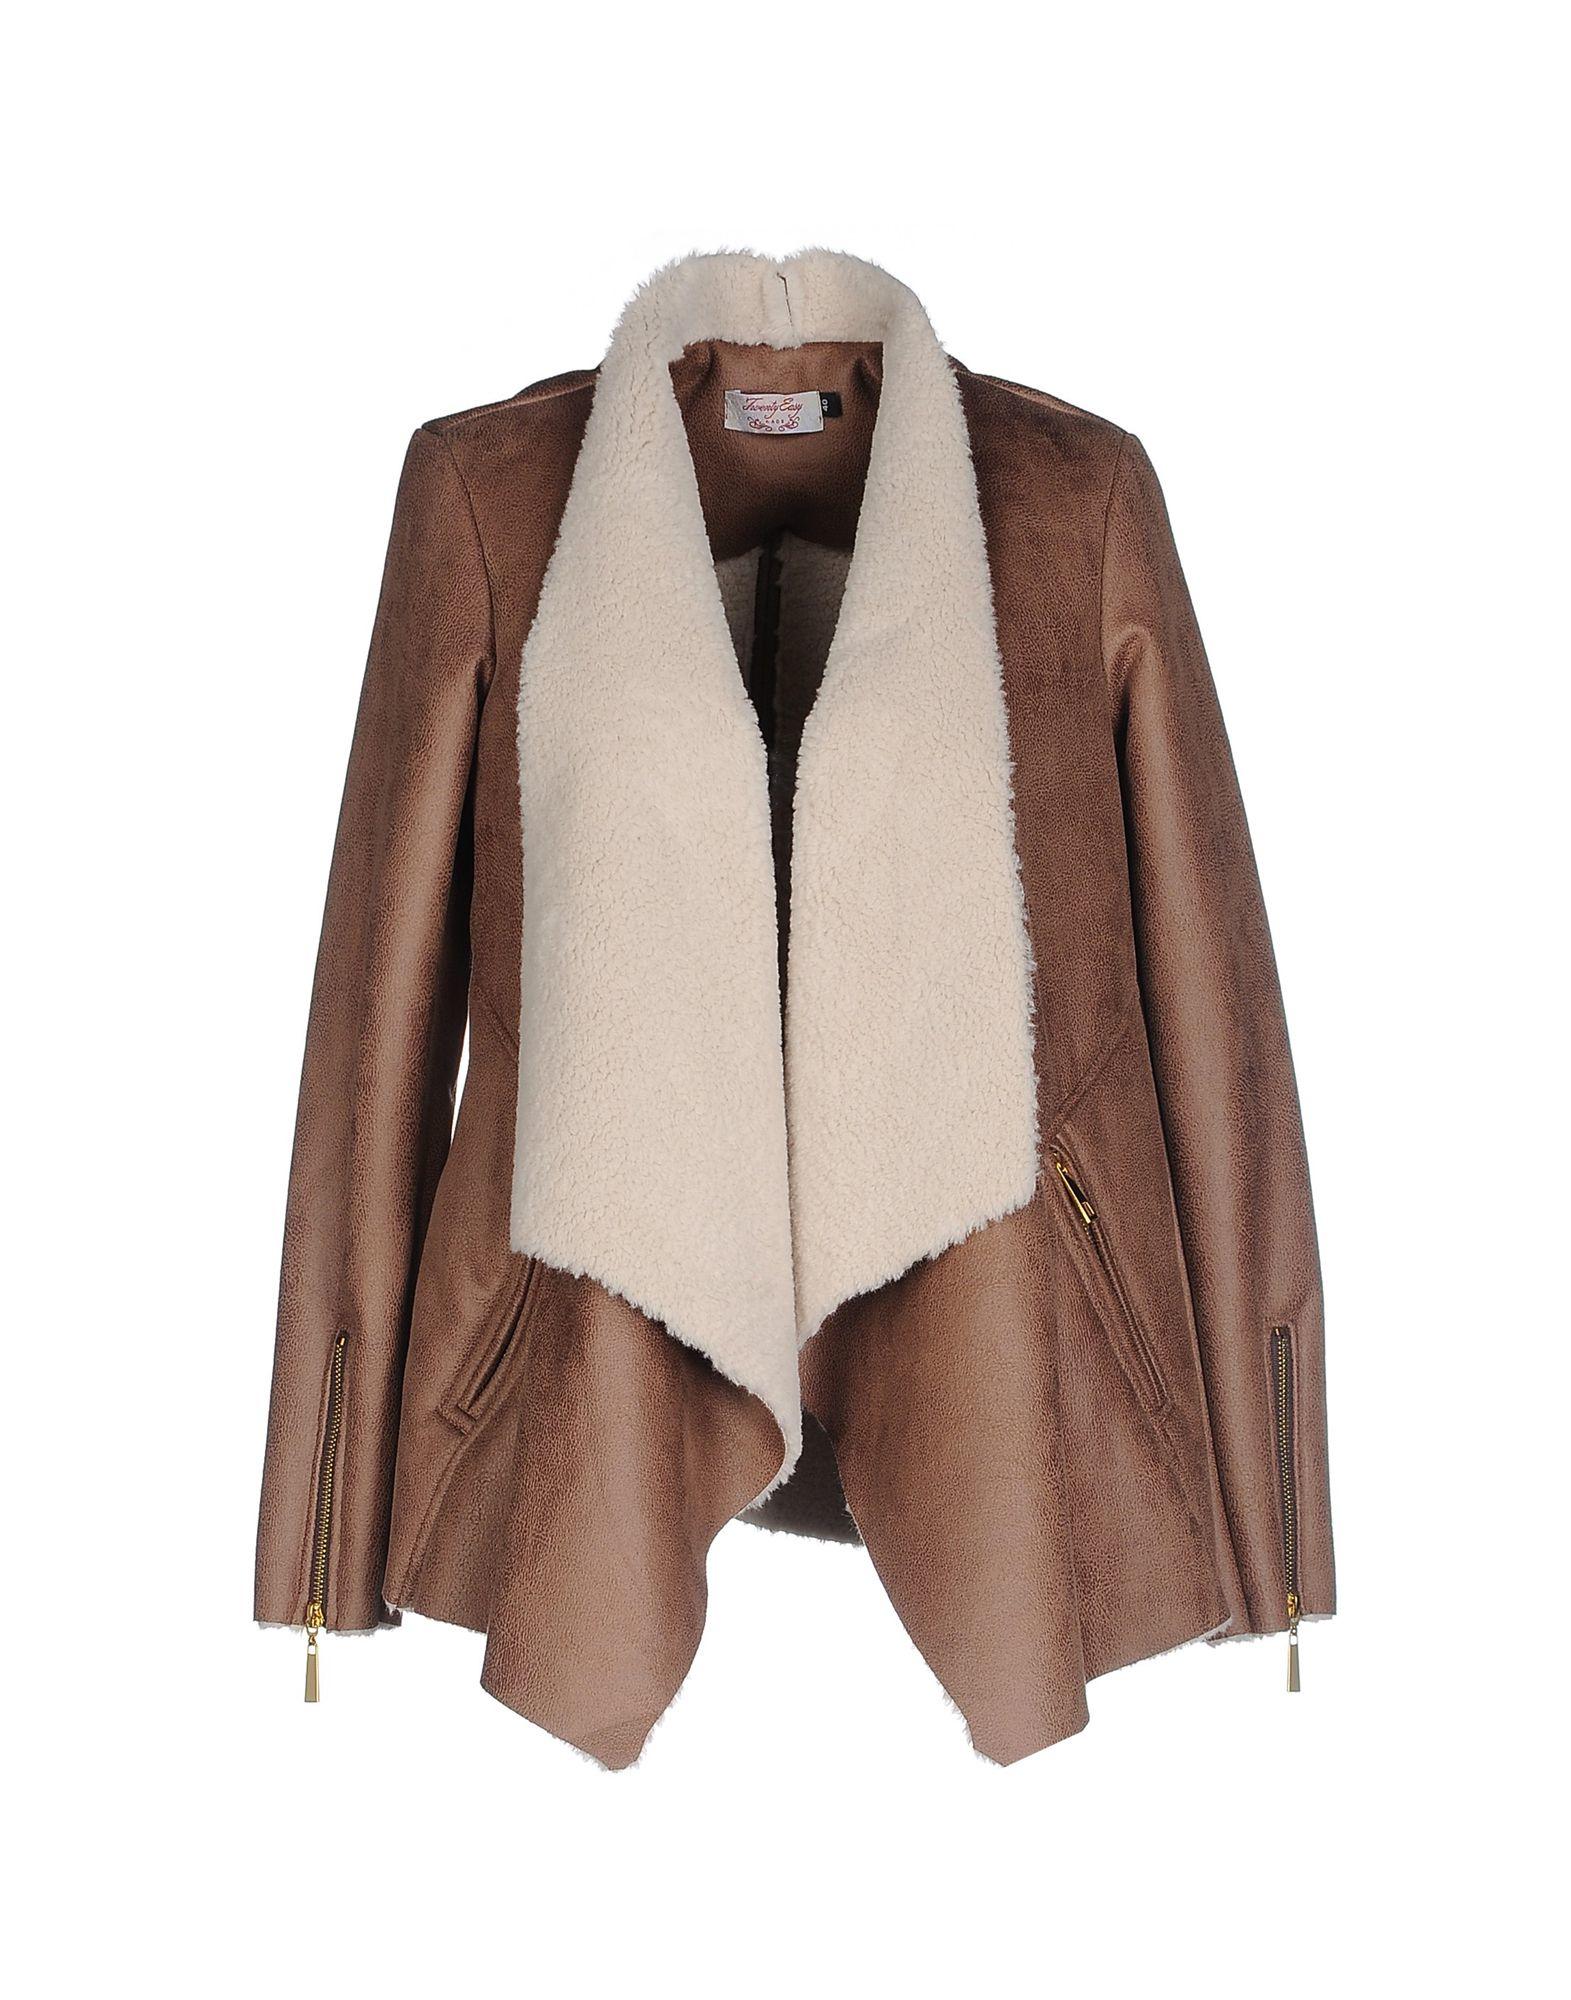 Kaos leather jacket